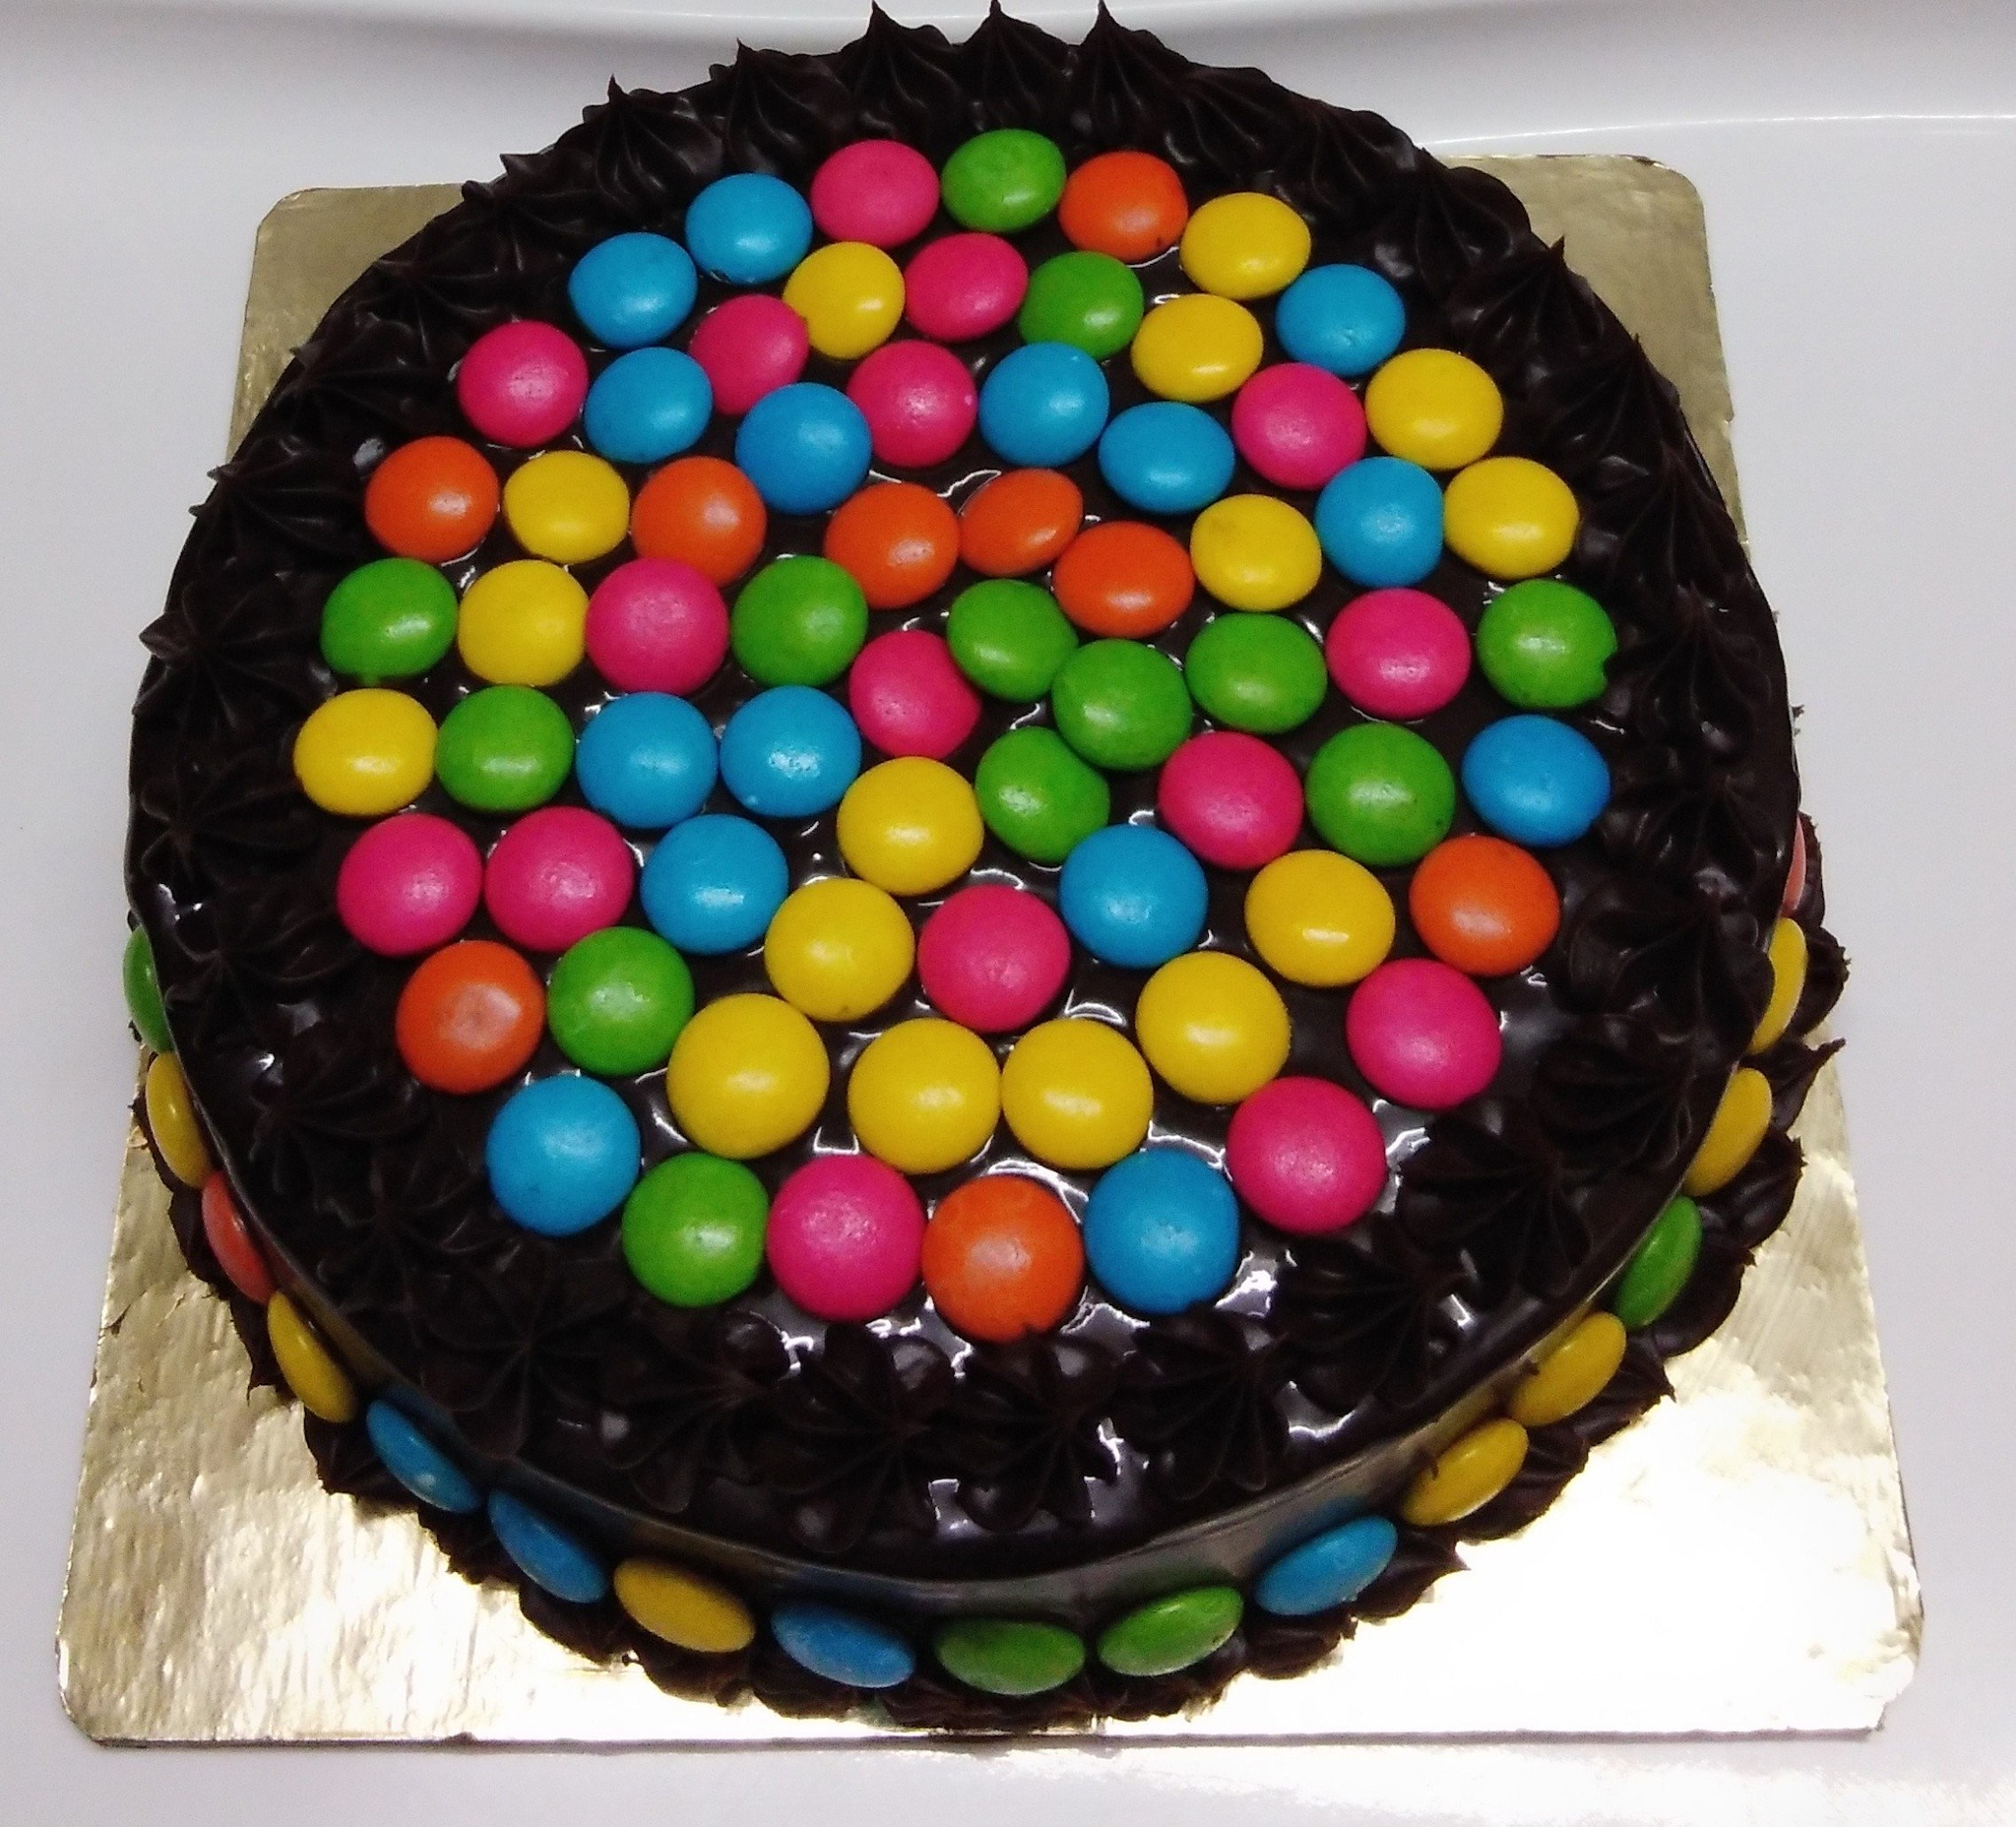 Chocolate Gems Balls Multi Colours Cake Decoration 100 Gm - Divena In